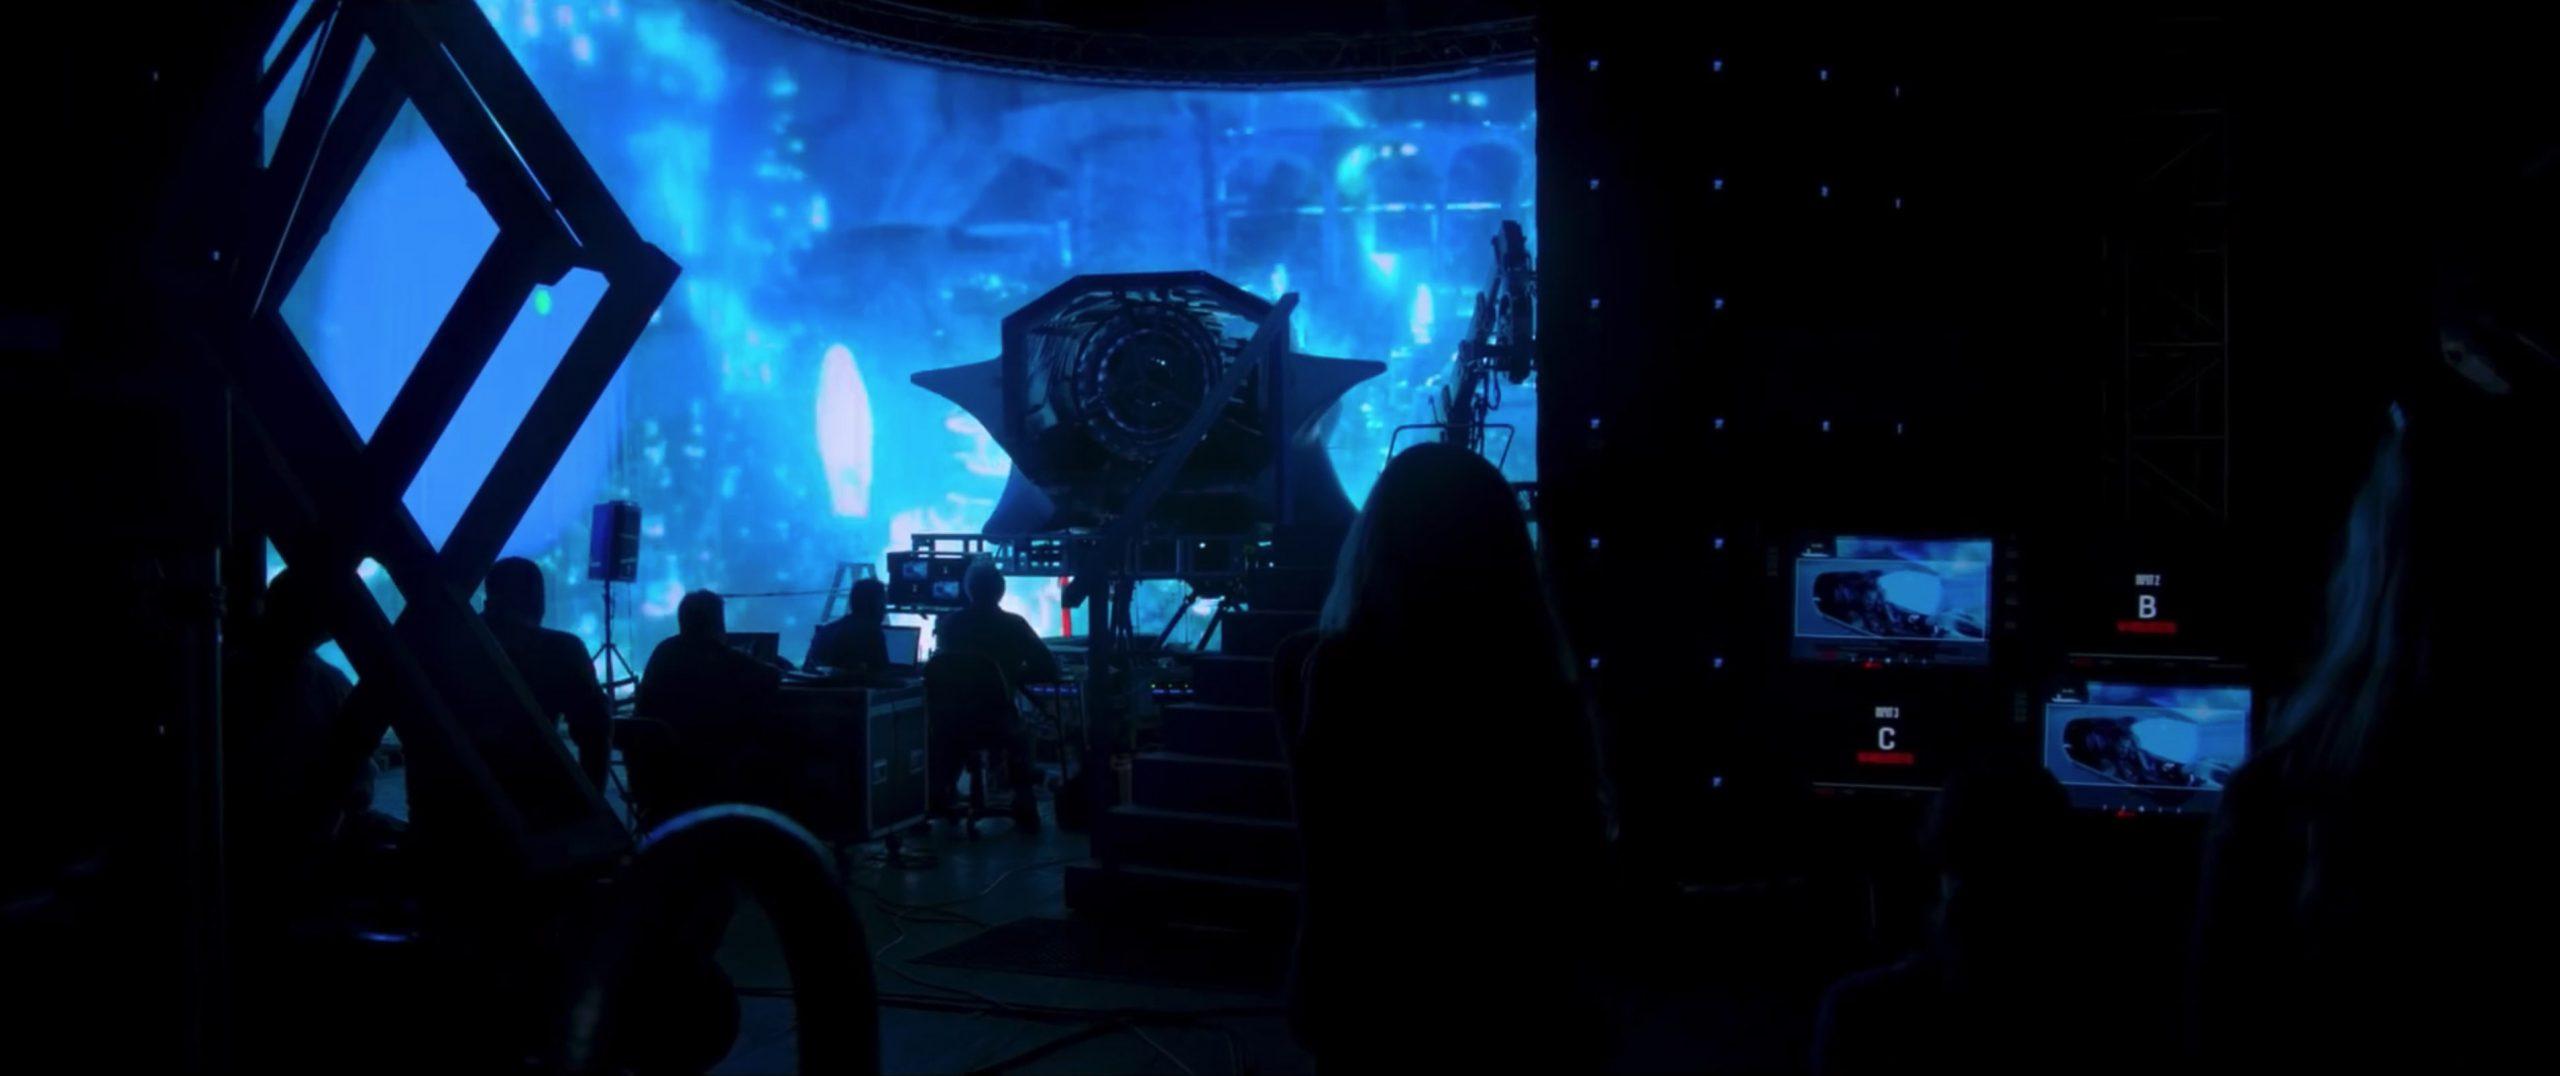 AquaMan-LED Production Shot